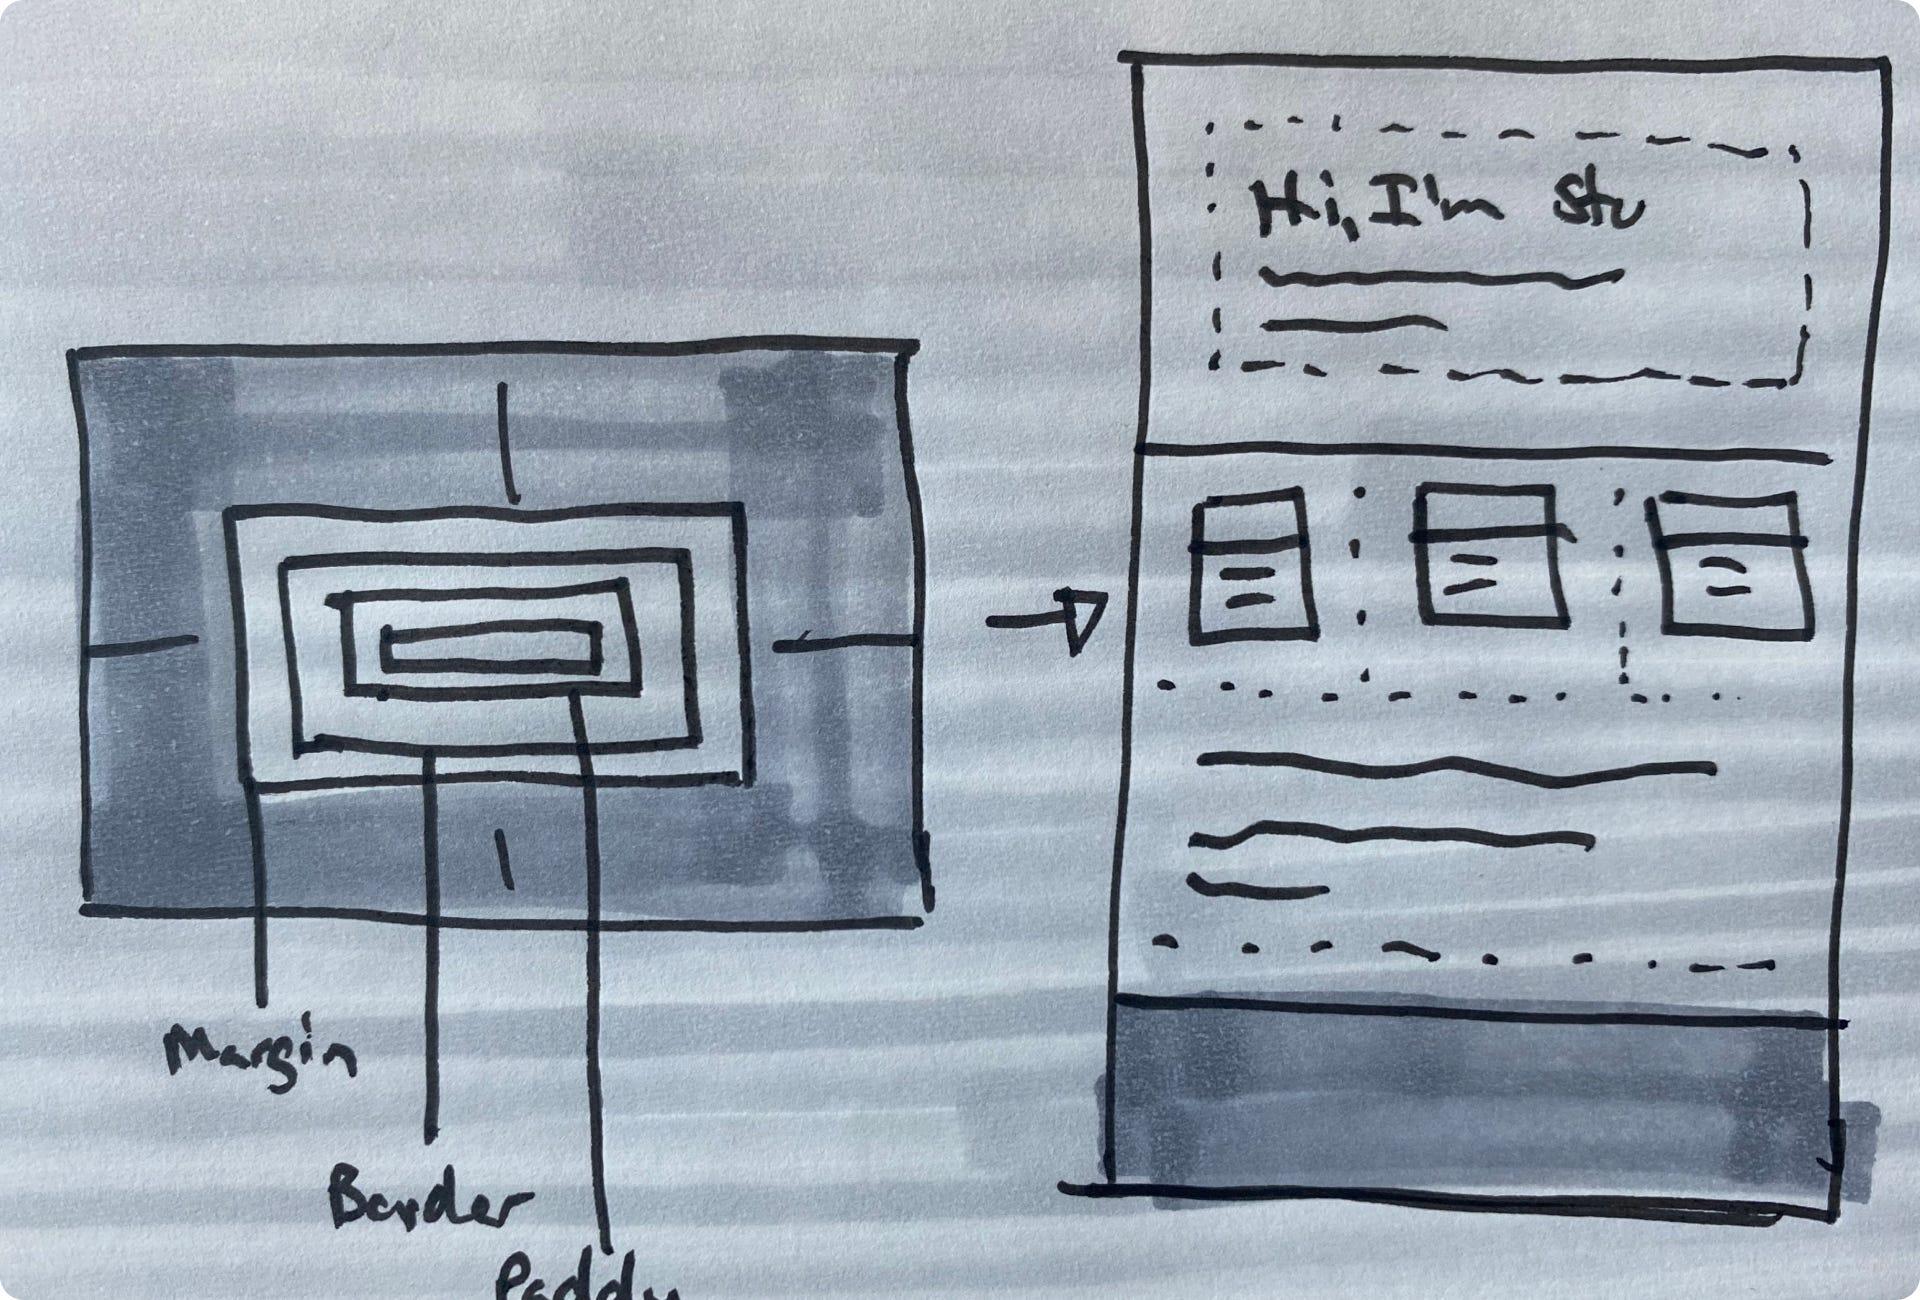 Sketch of box model